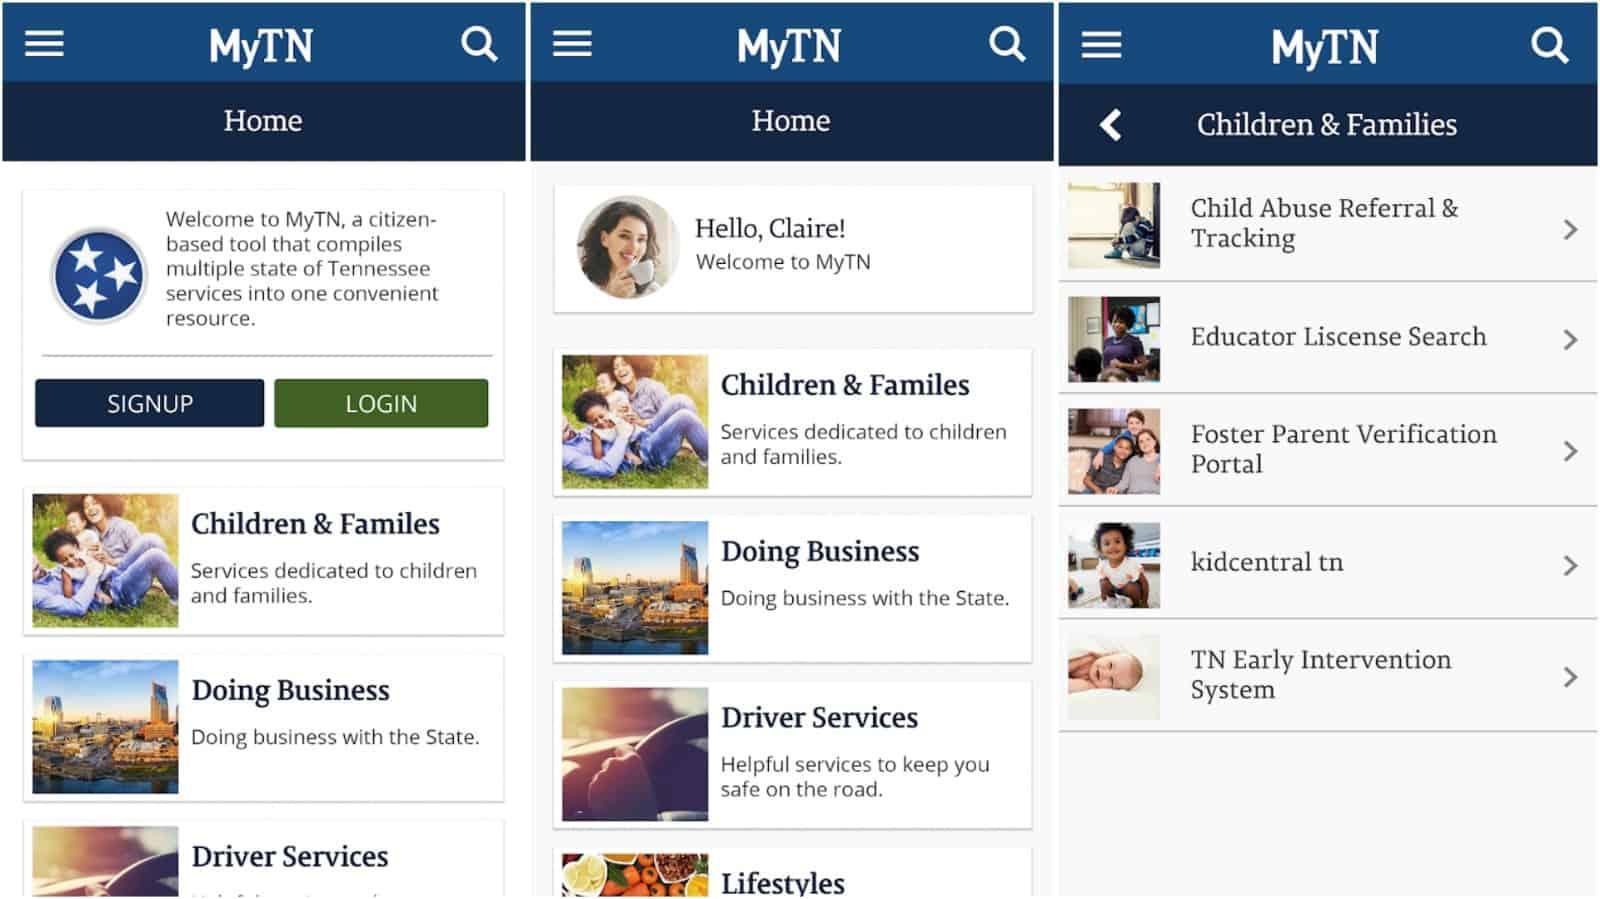 MyTN app grid image